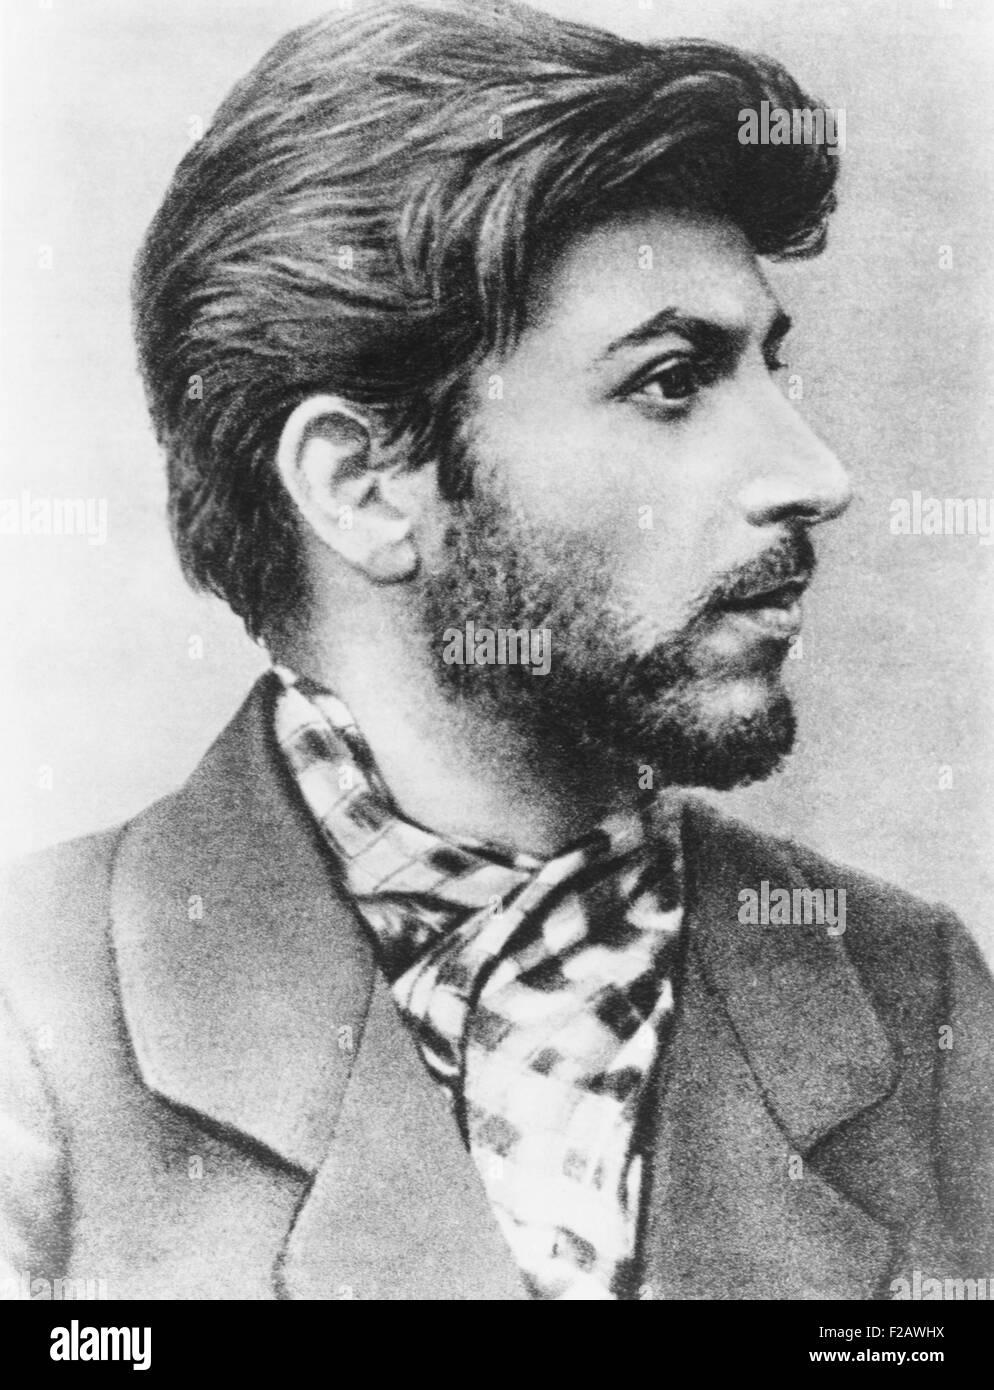 Josef Stalin as a young revolutionary. 1900. (CSU_2015_11_1362) - Stock Image